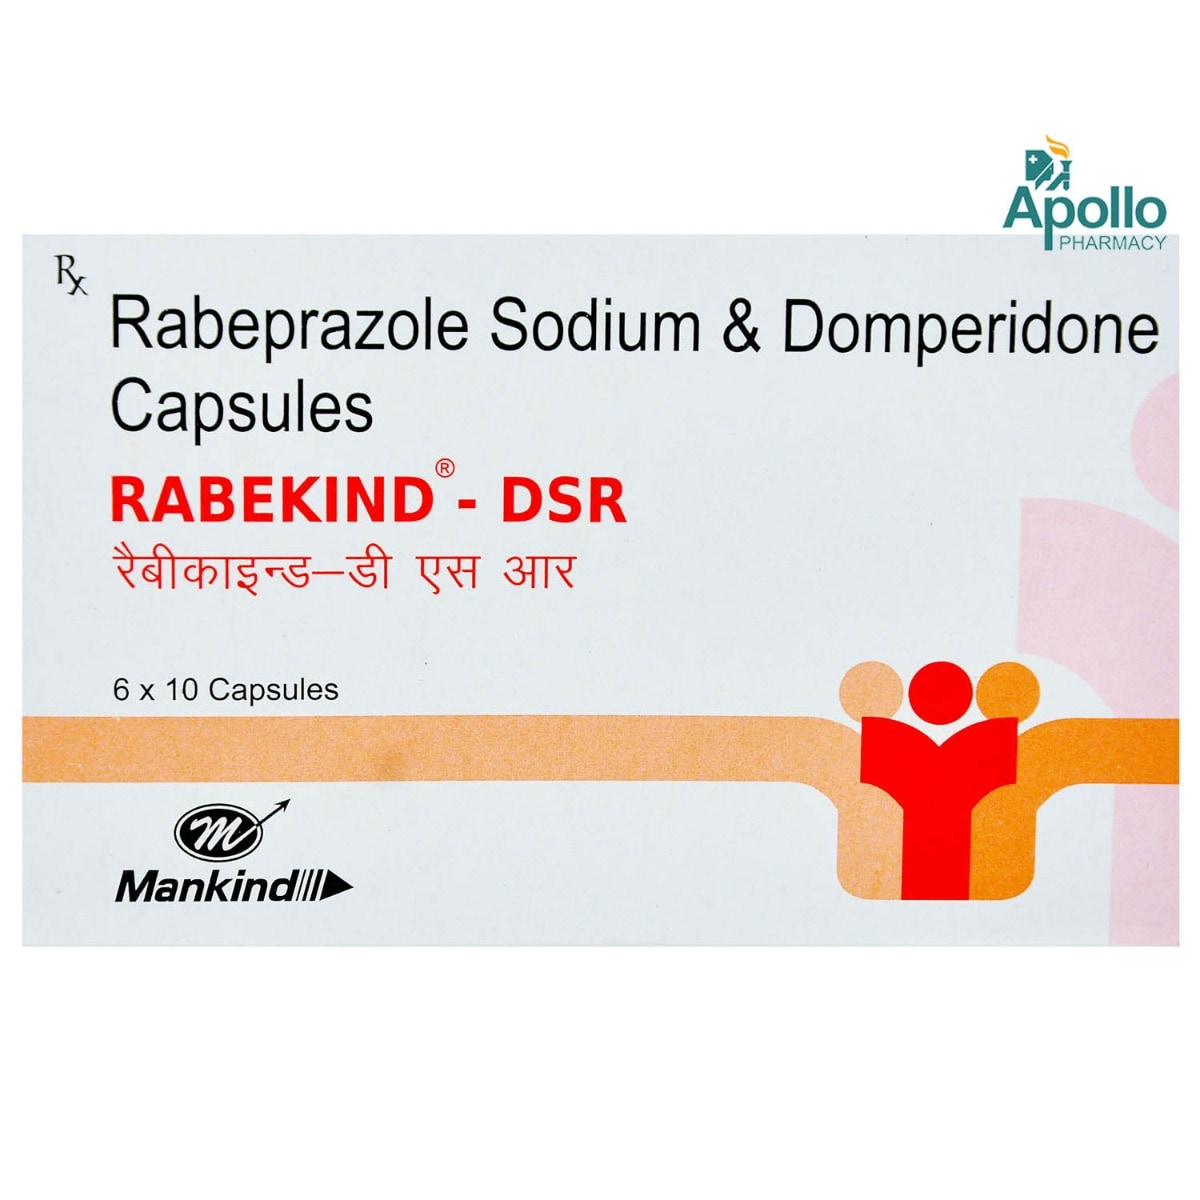 Rabekind-DSR Capsule 10's